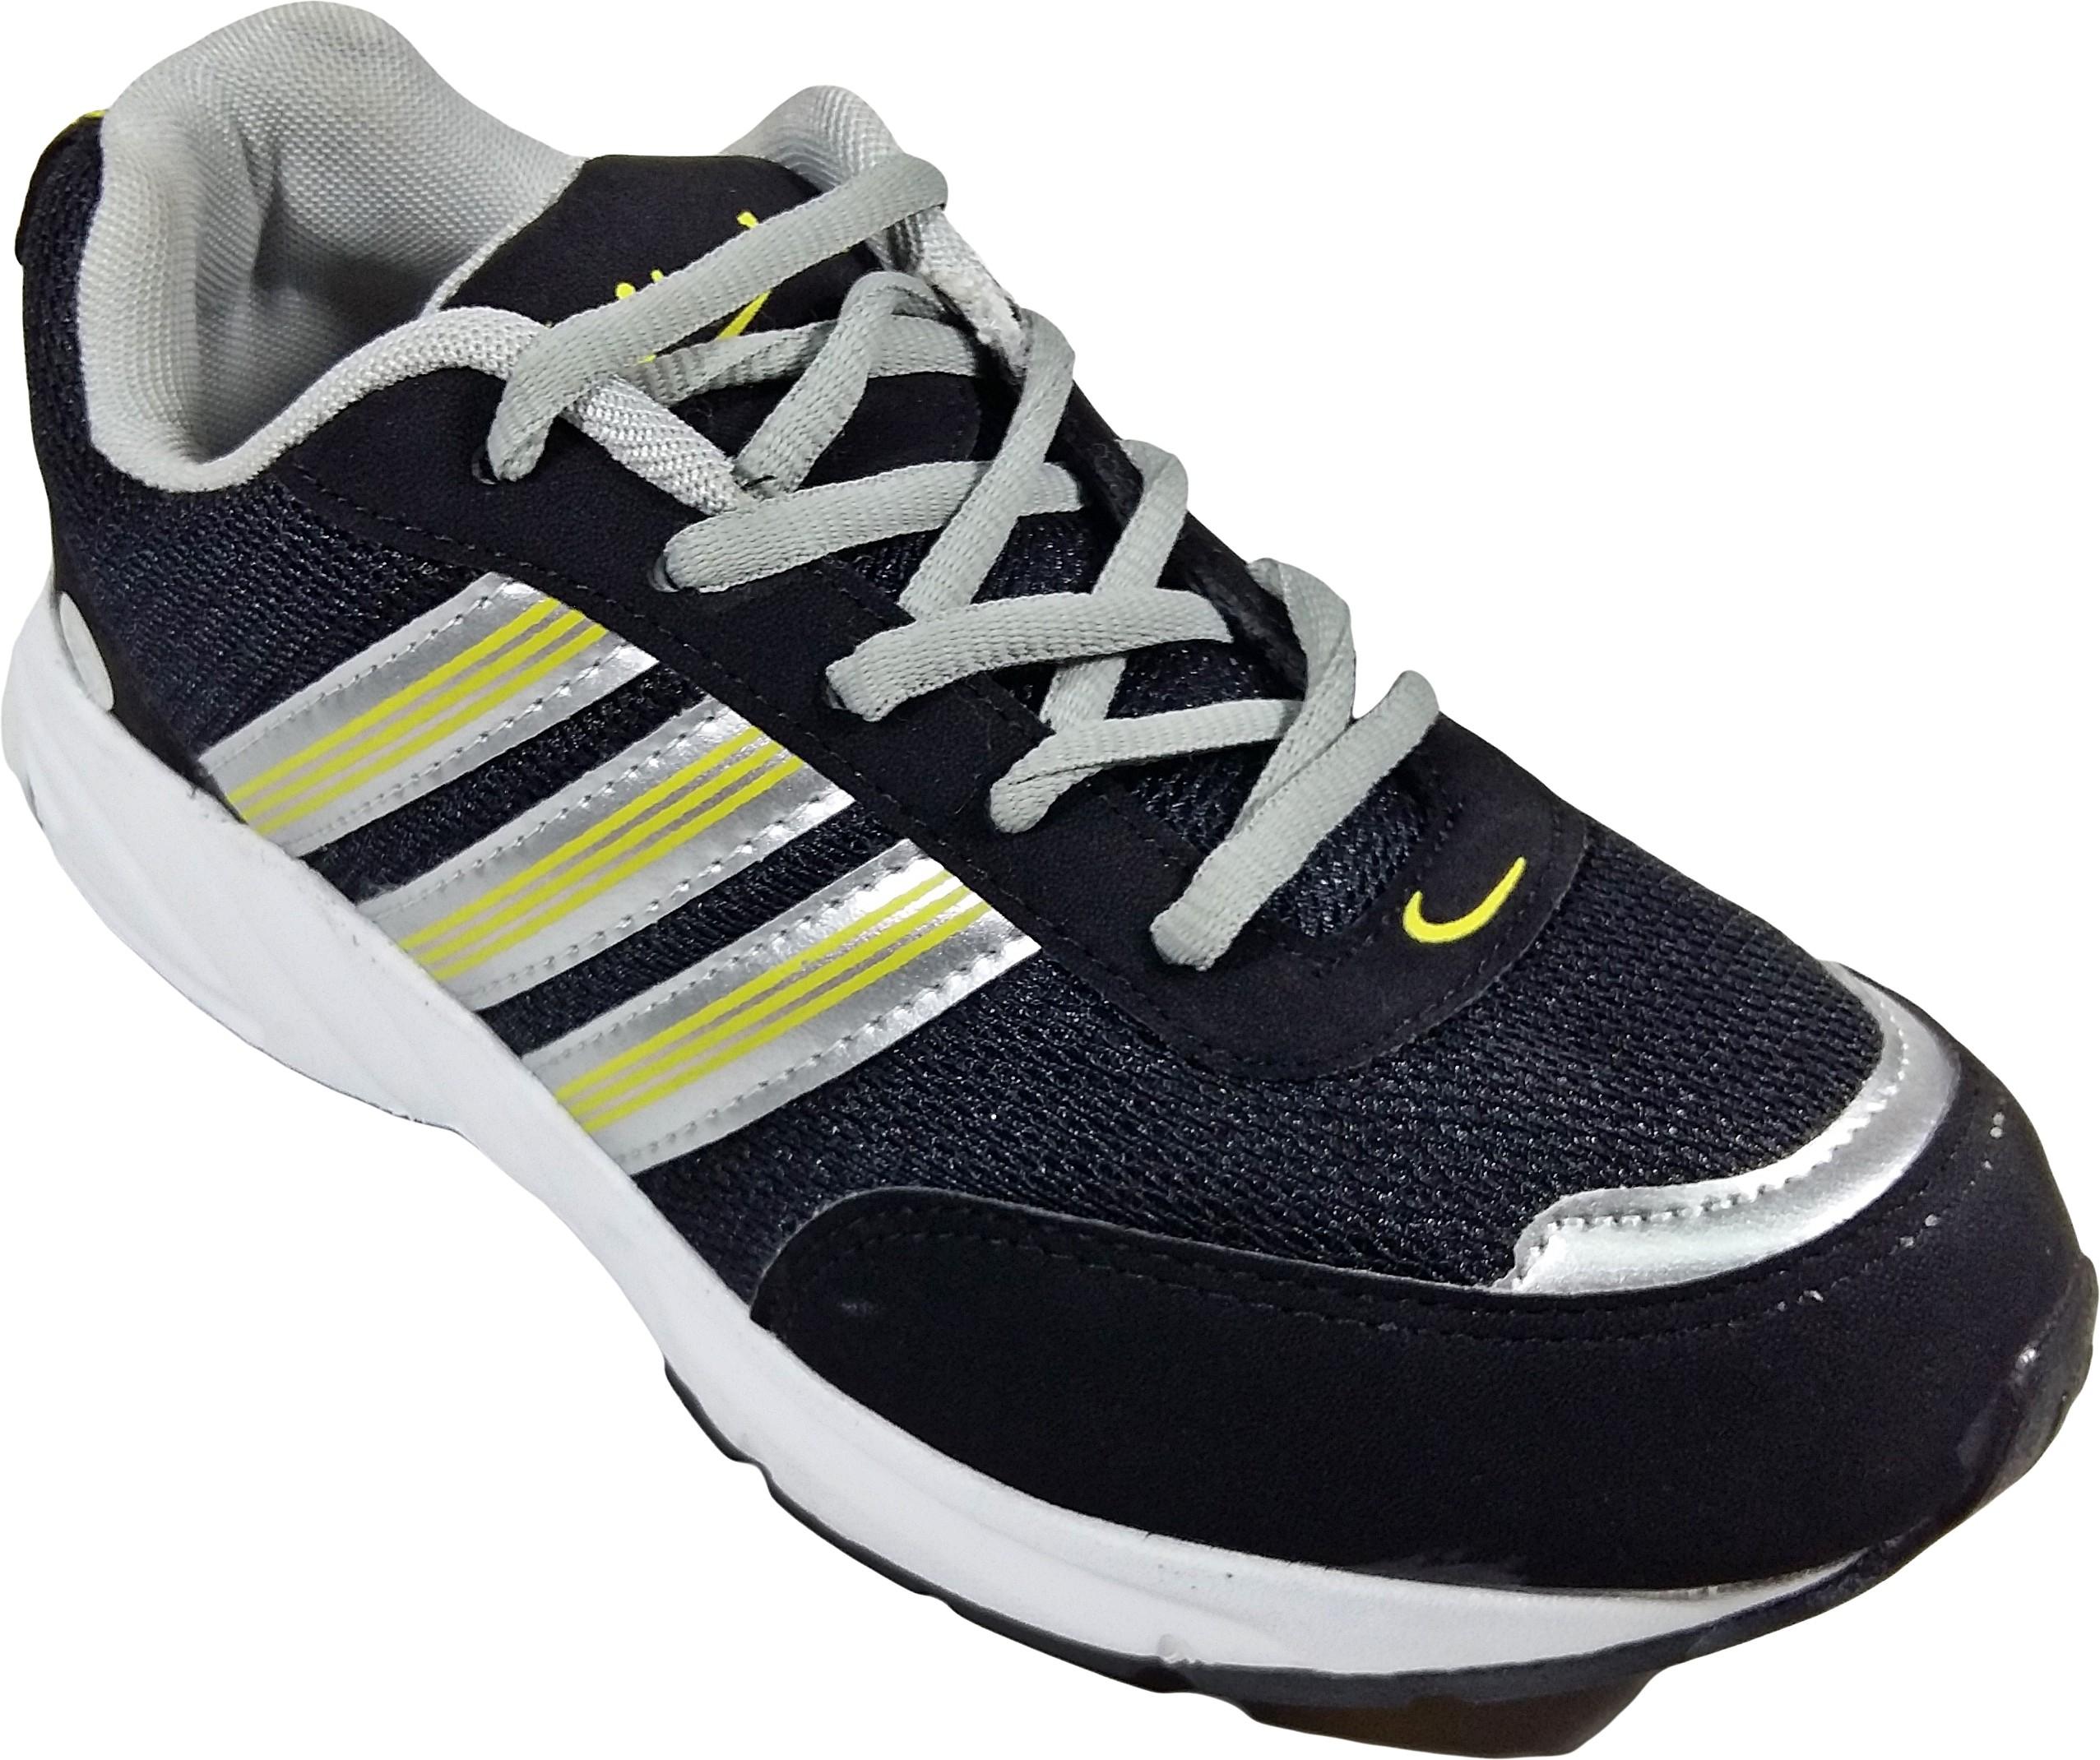 WBH Black Yellow Sports Running Shoes